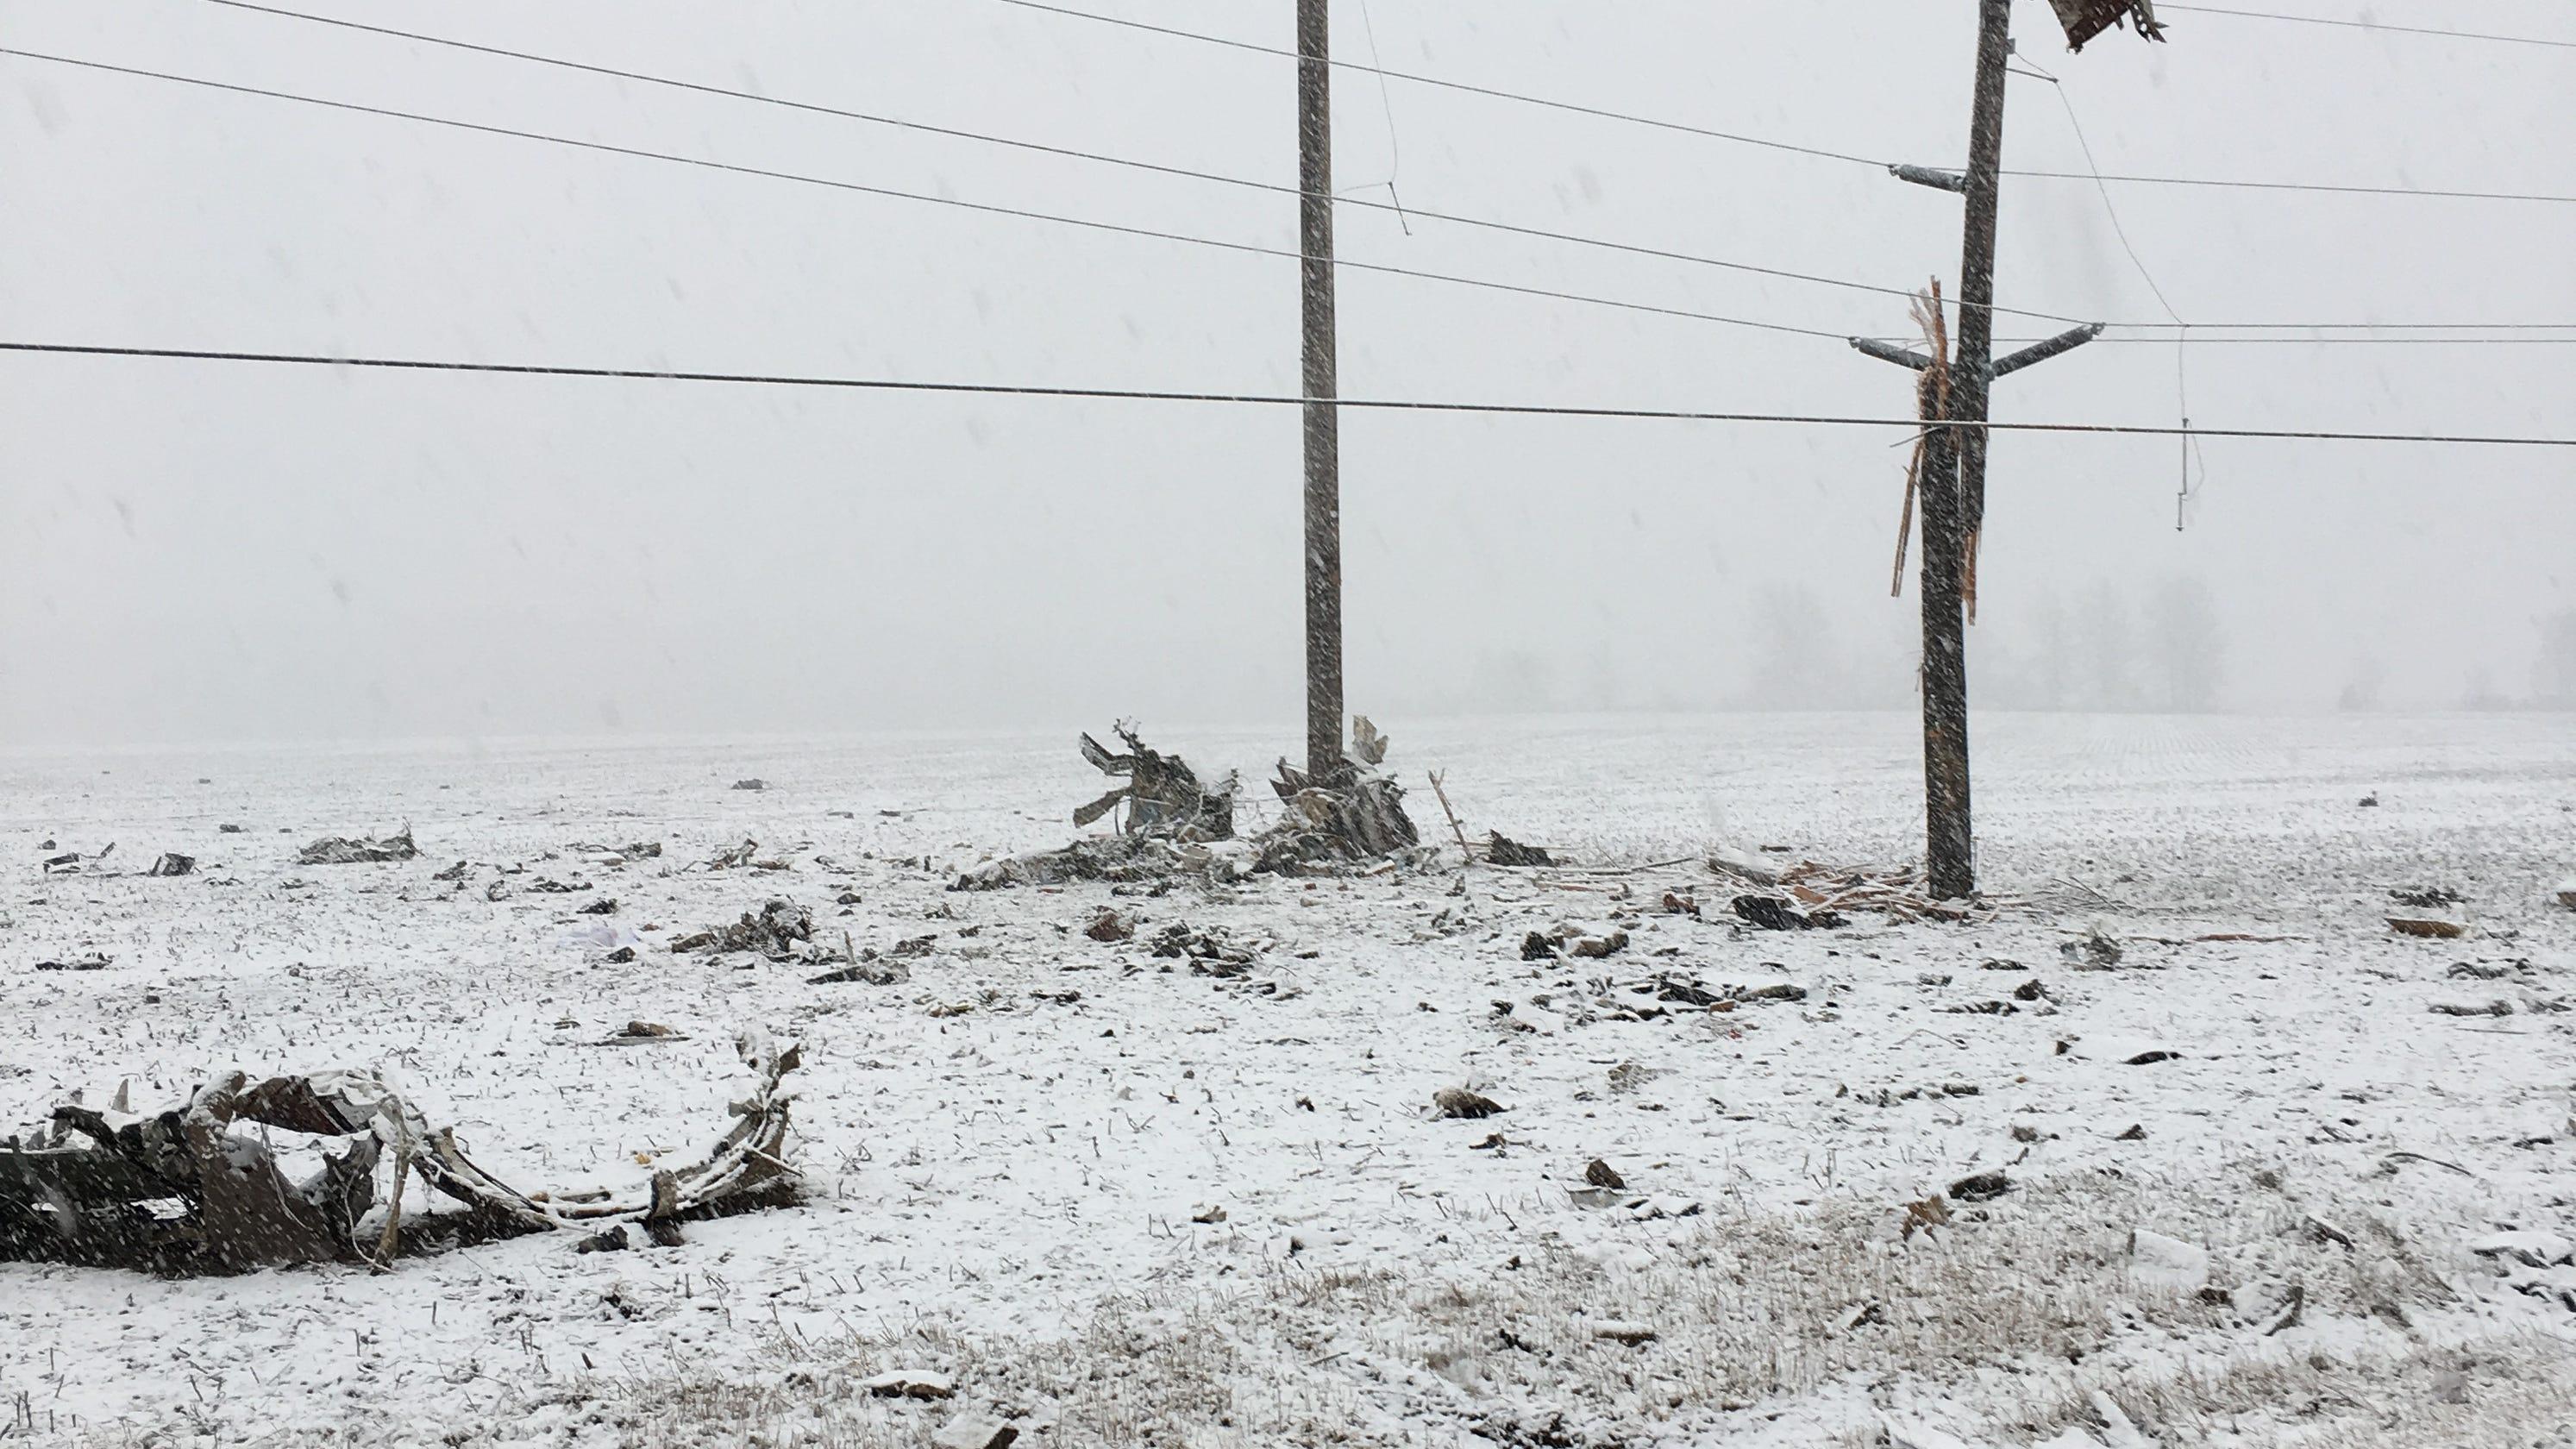 Matthew A. Hayden of Phoenix killed after plane crashes in